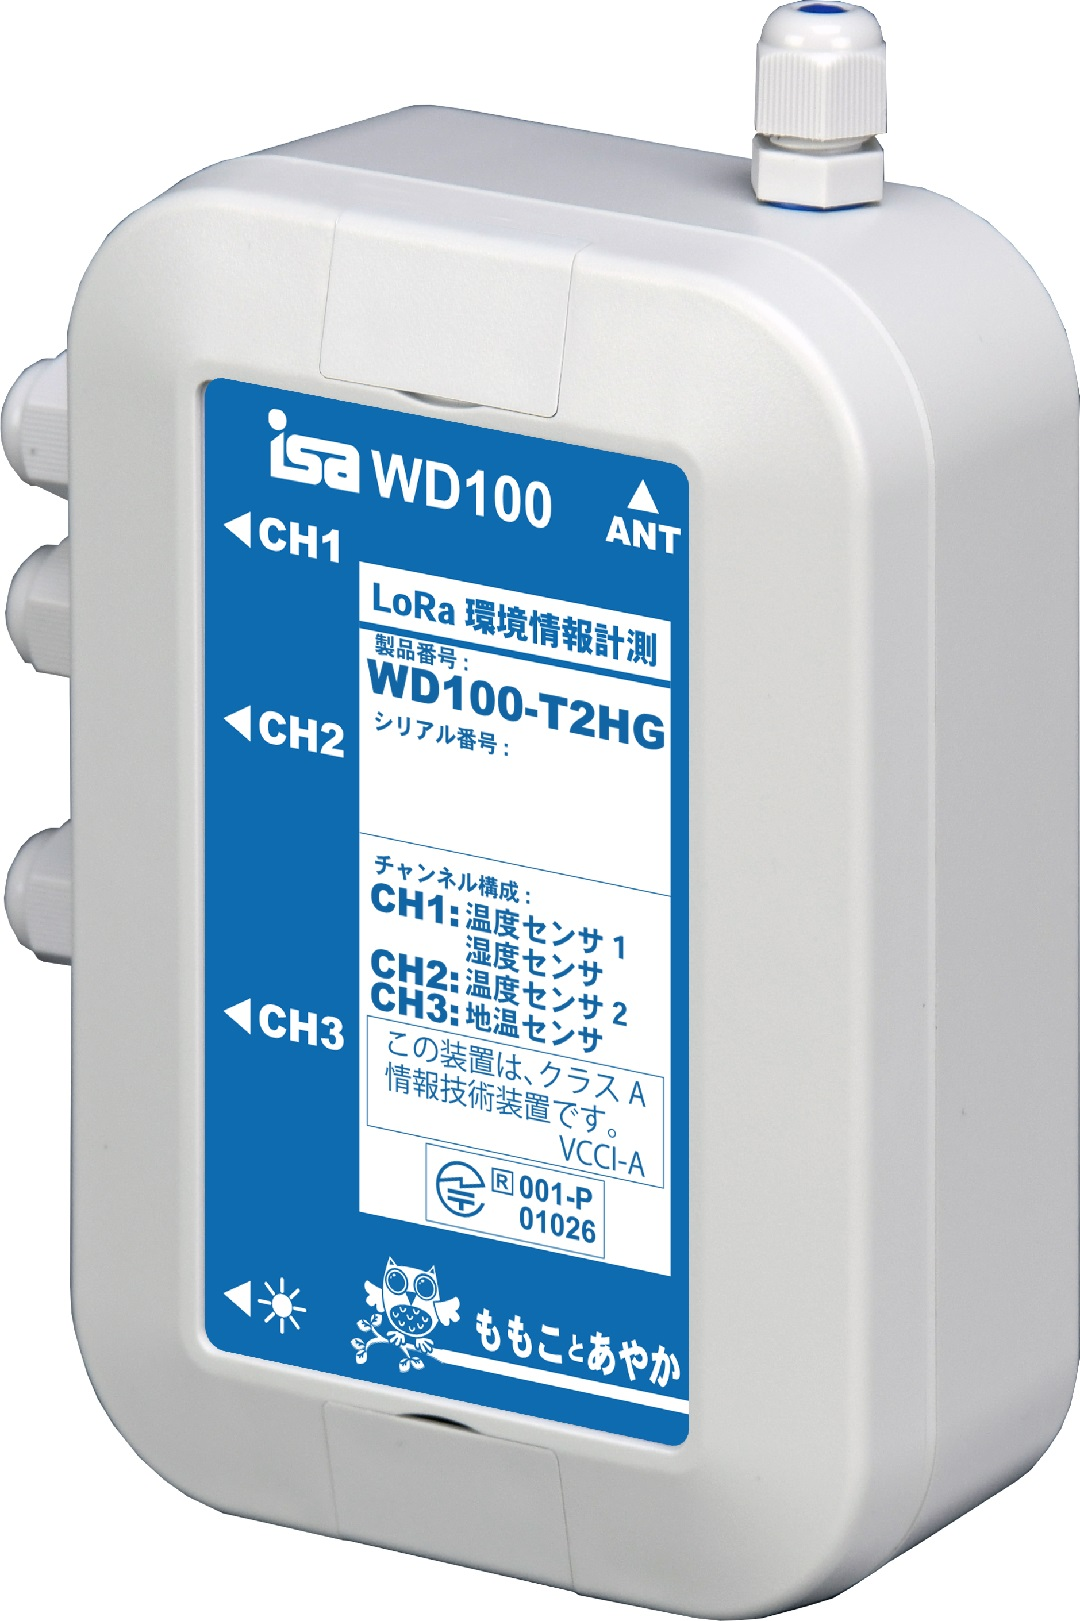 [ 無線通信 ] WD100-T2HG画像